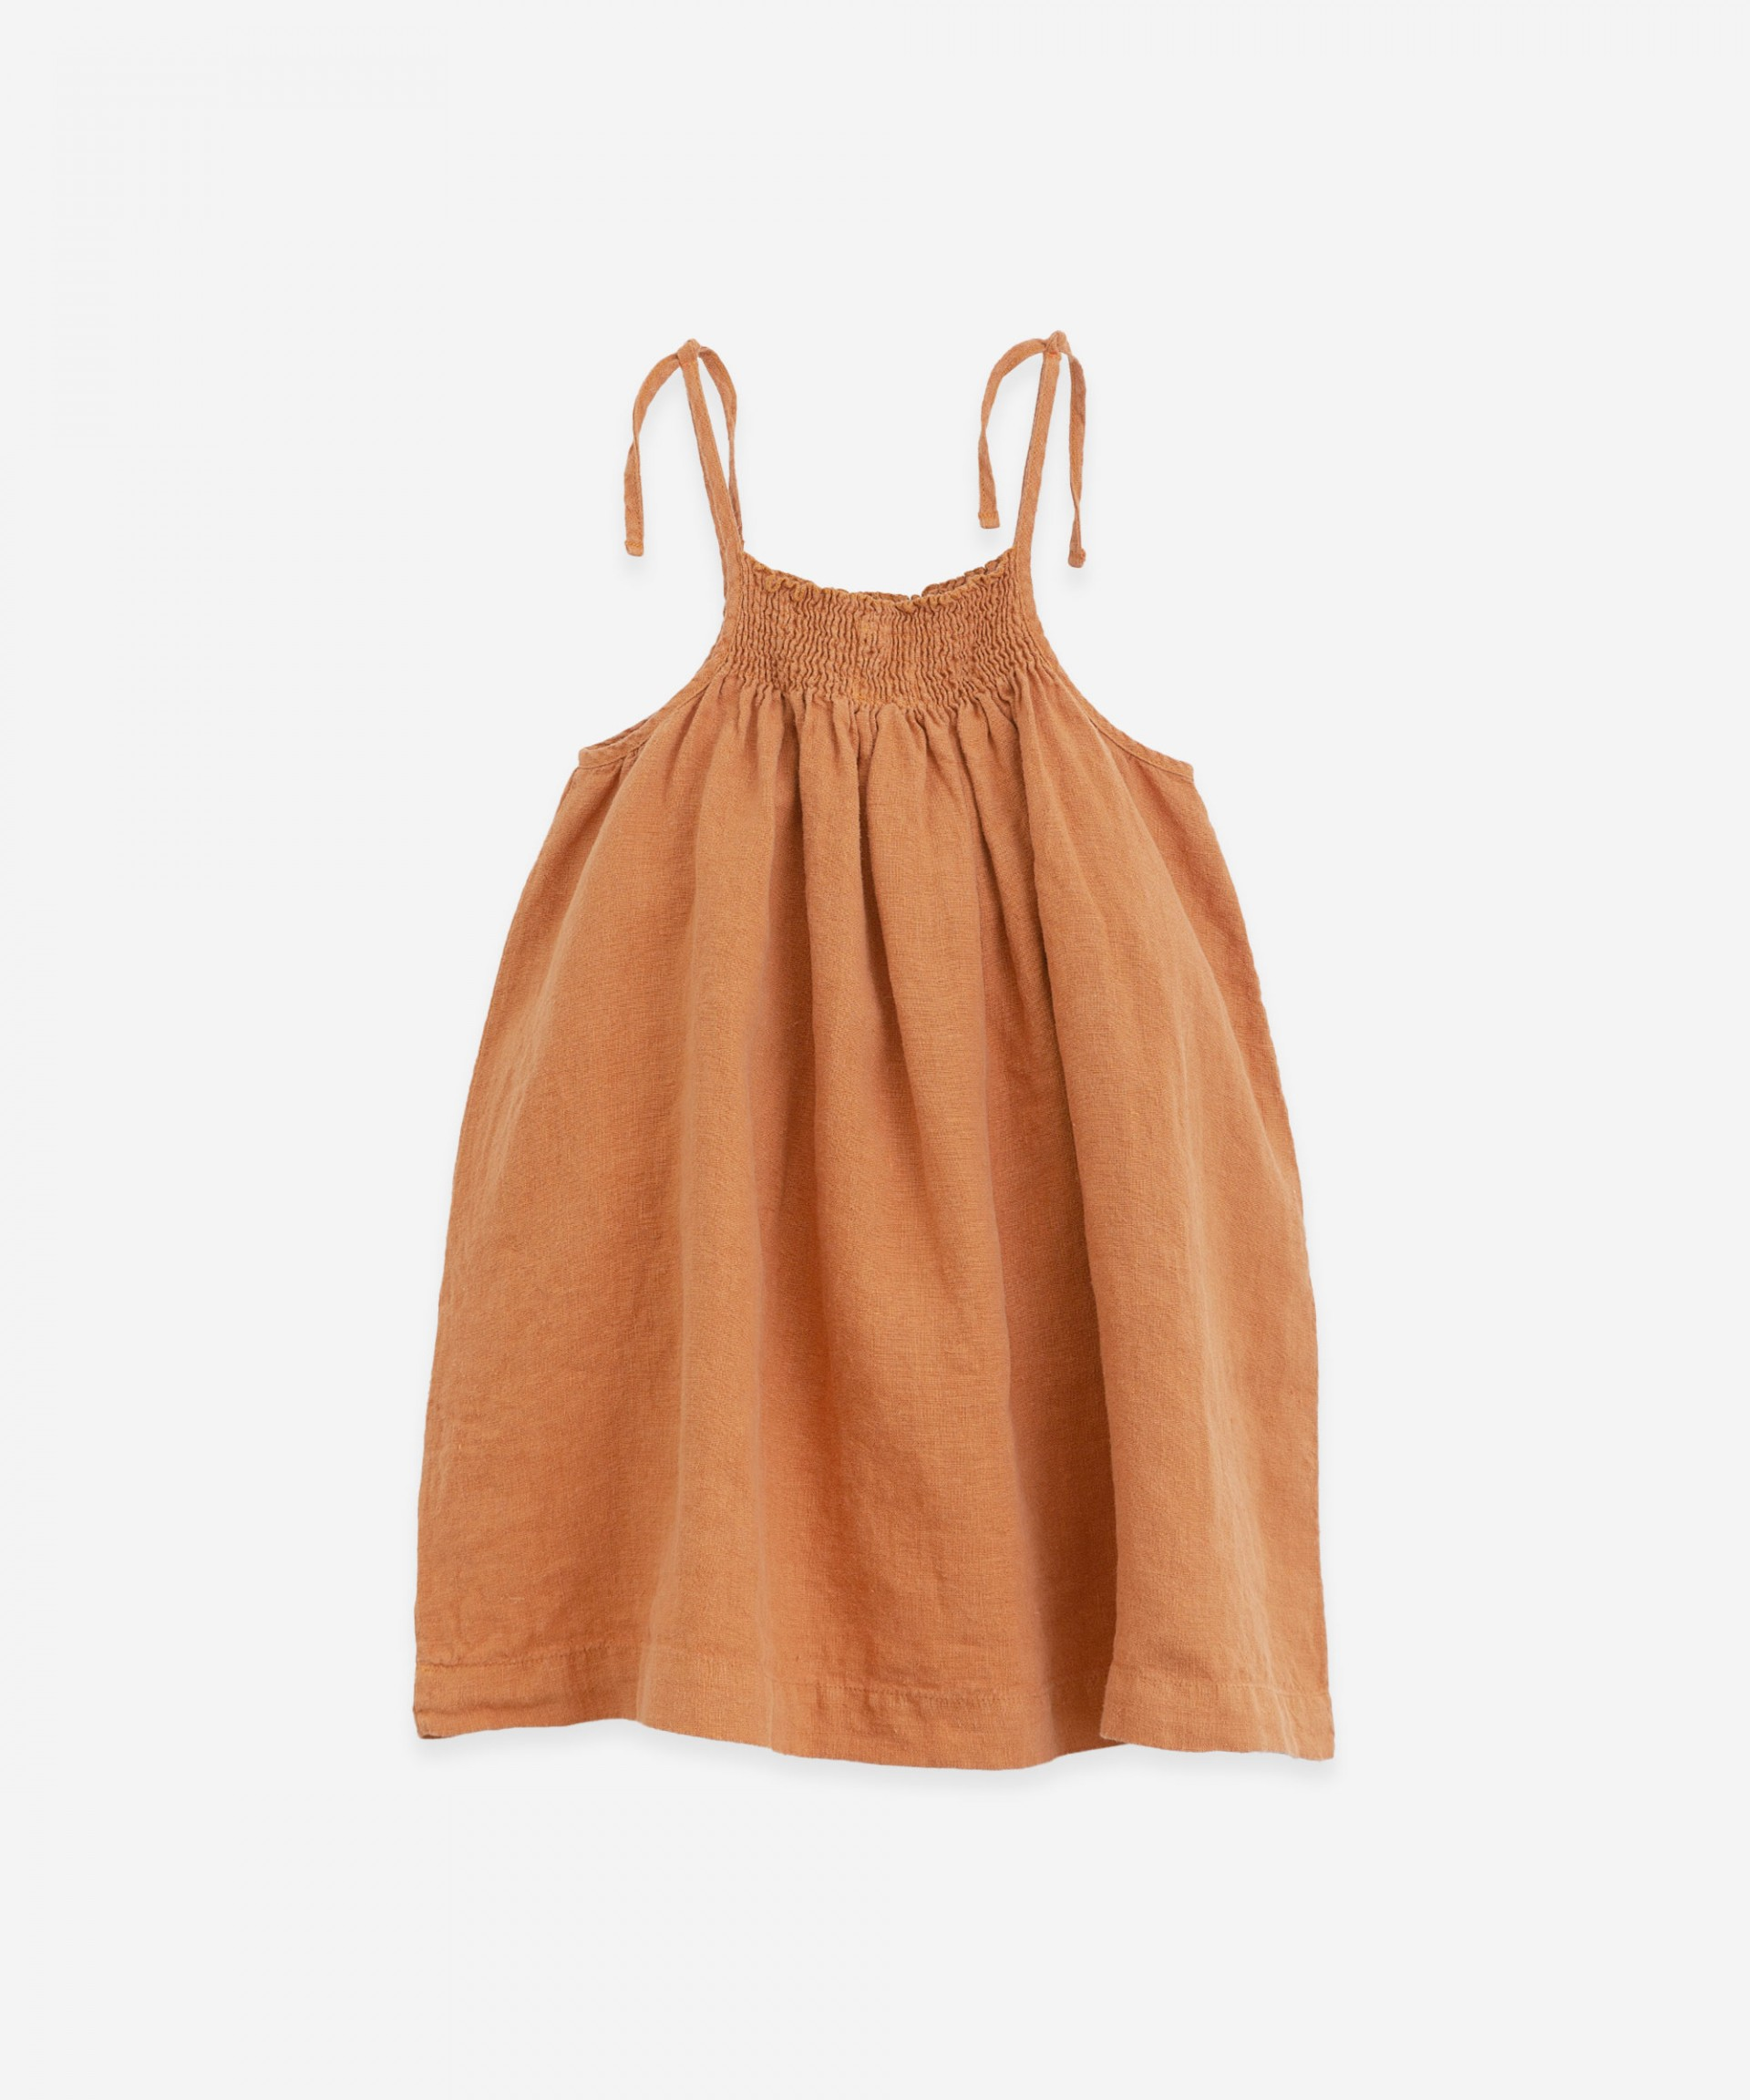 Dress with straps | Botany